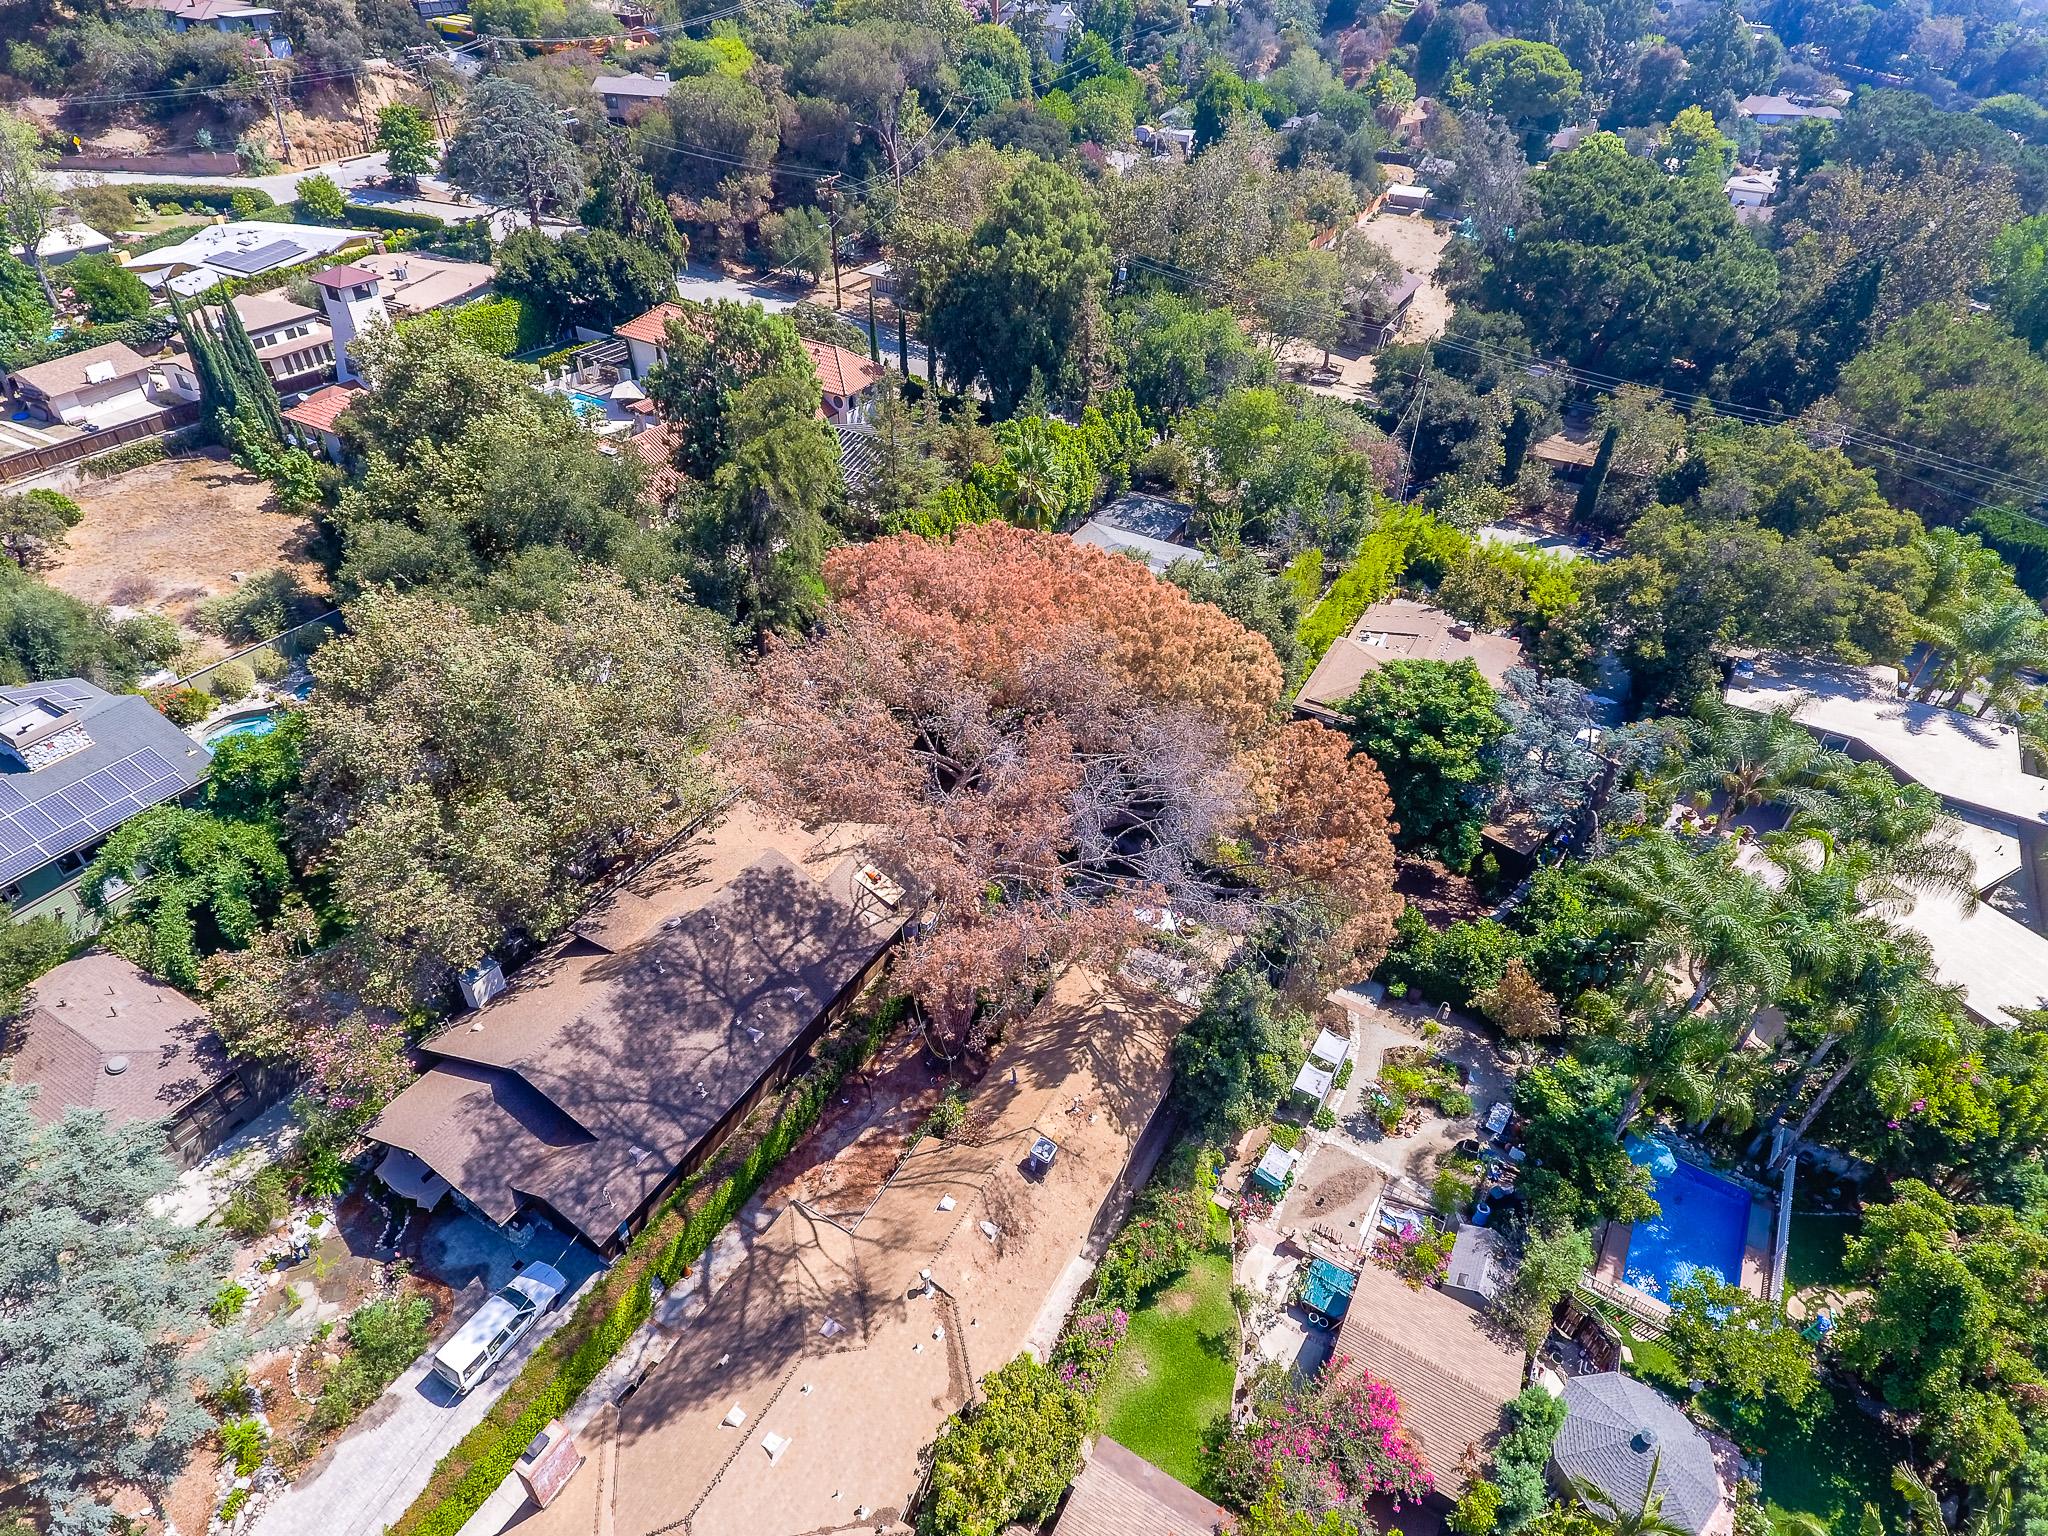 Mariposa Tree Removal Aerial 2-18.jpg